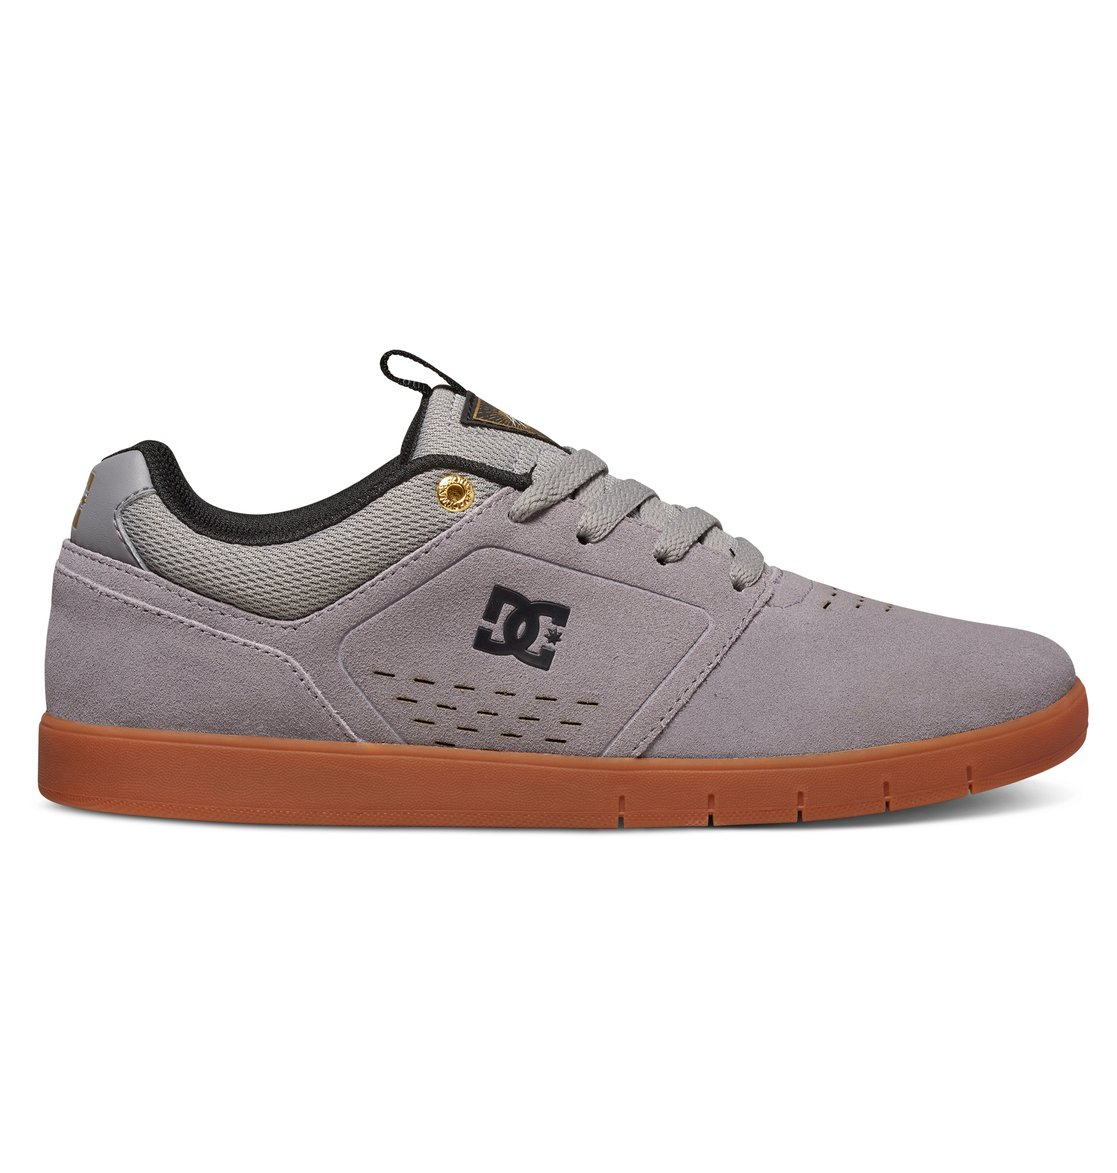 DC Mens Cole Signature Skate Shoe  6HSVBW0S2